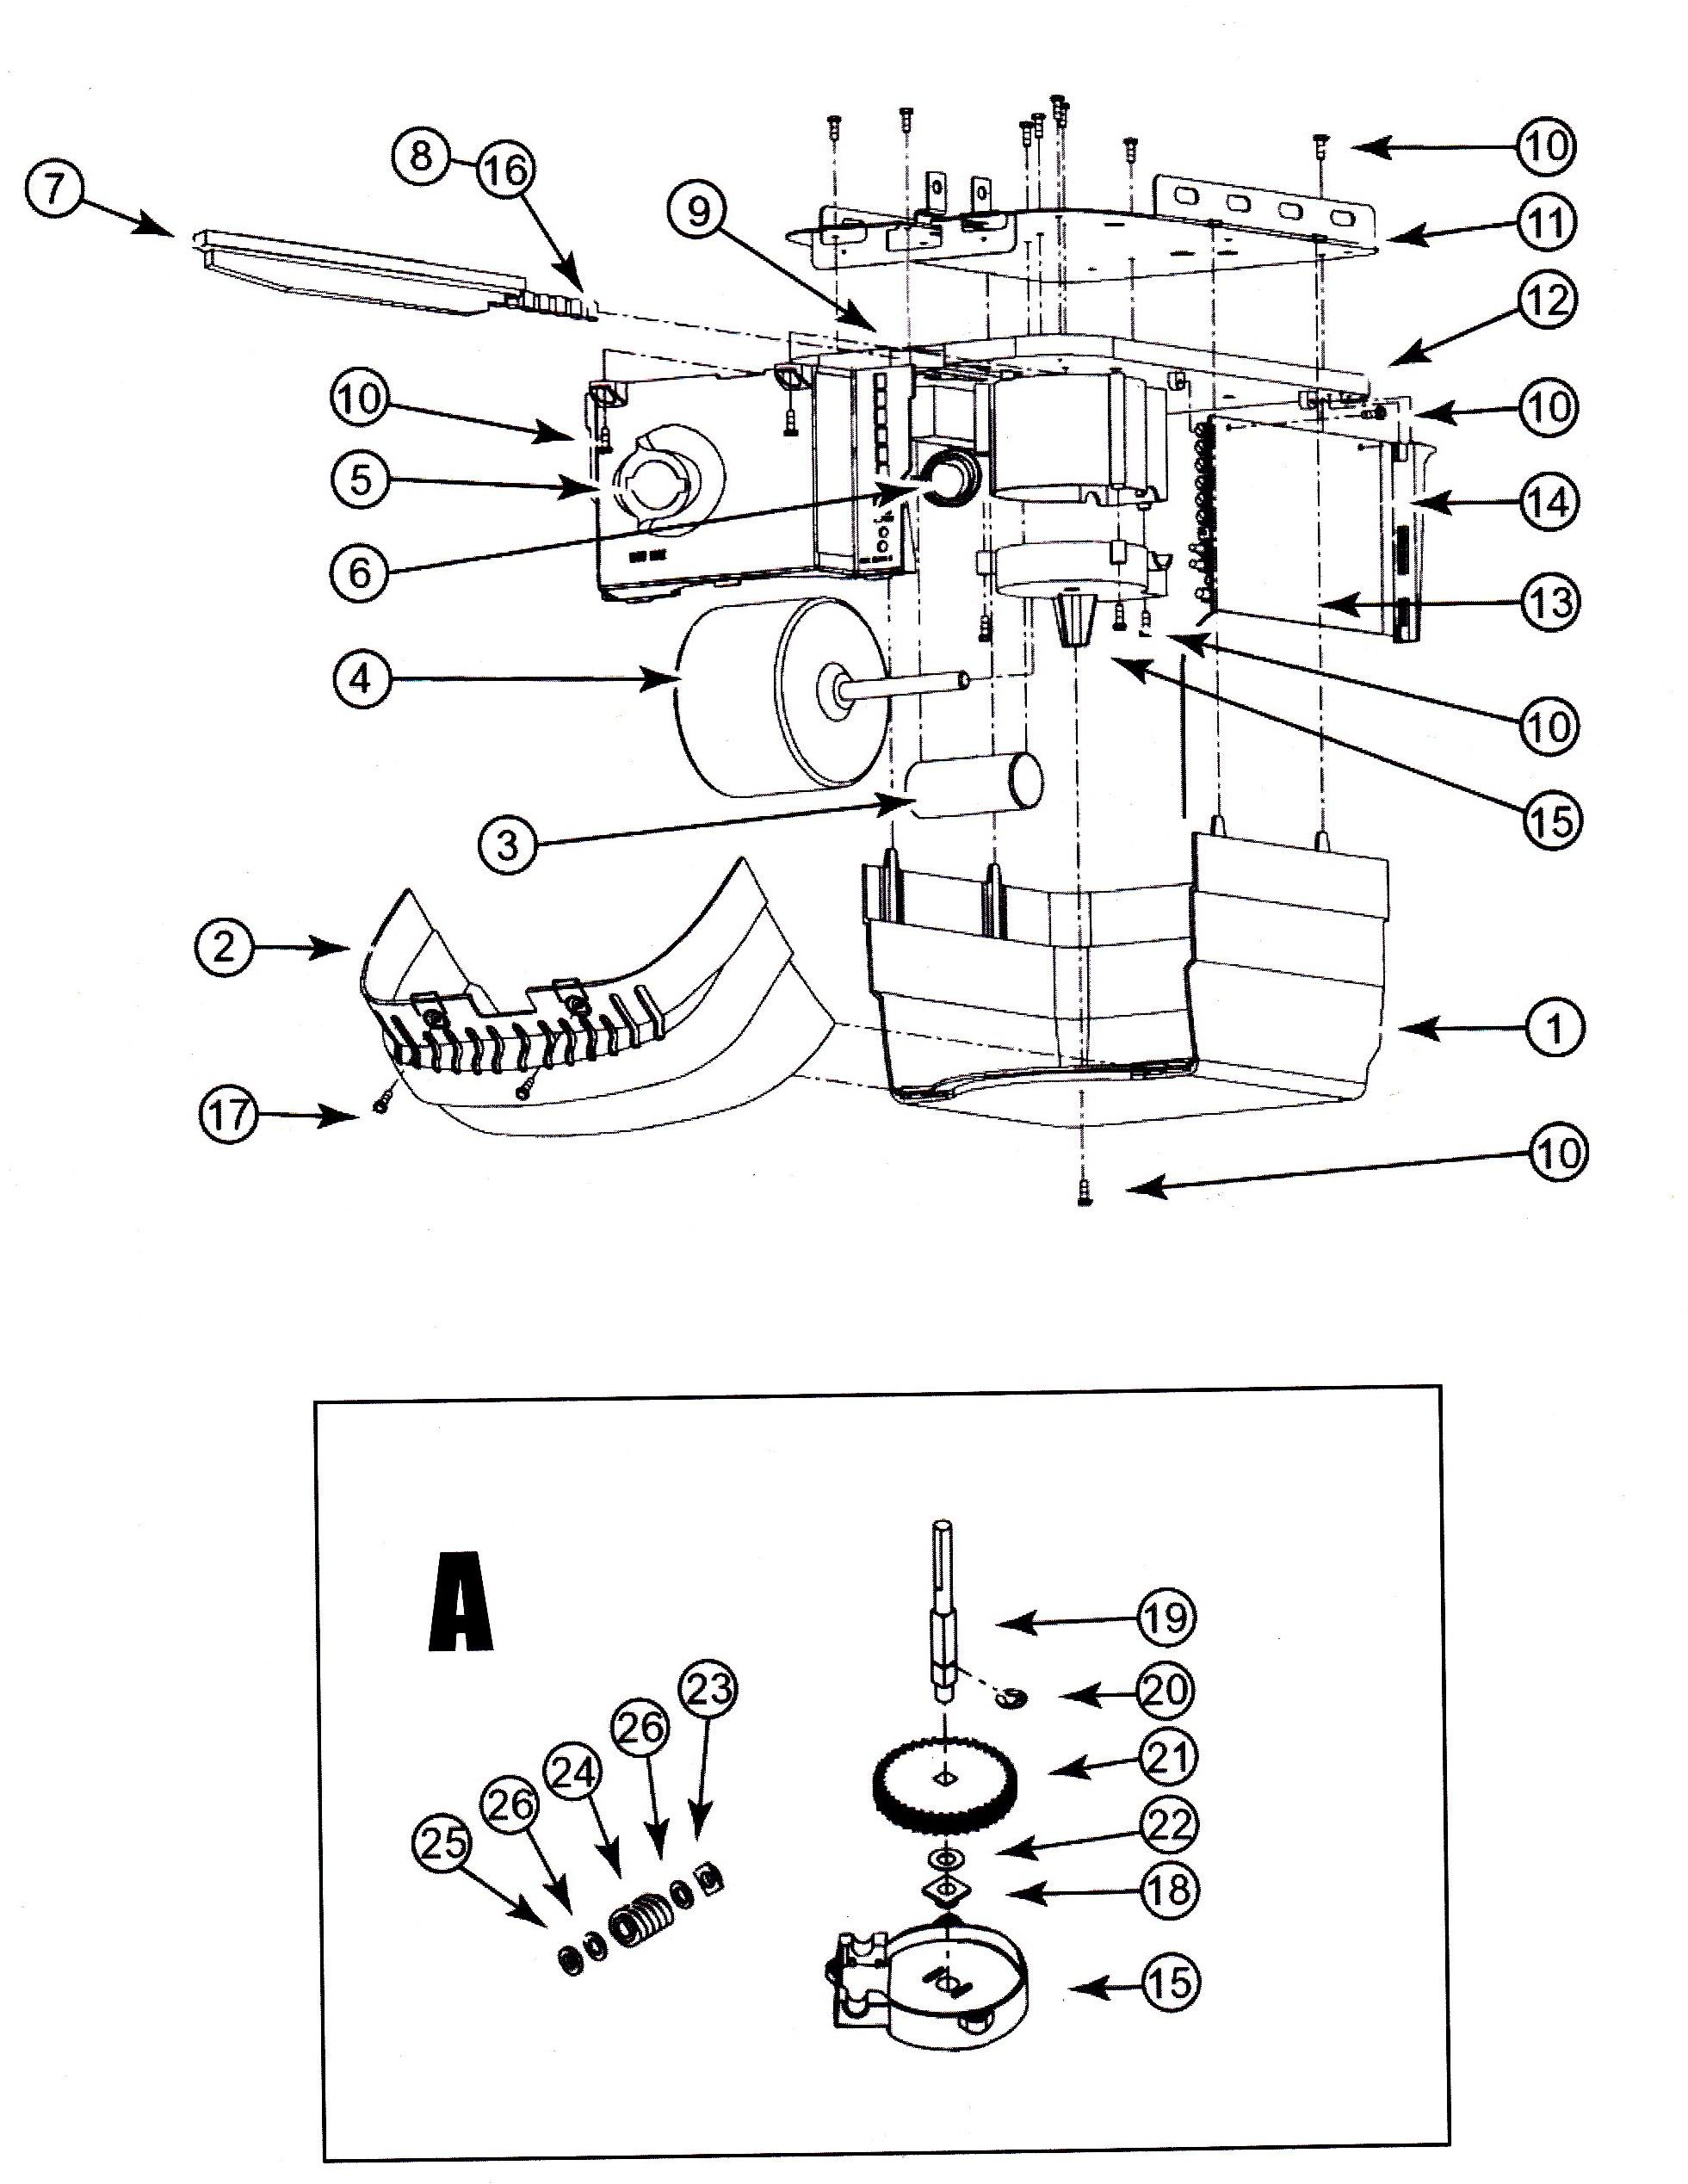 genie lift 1930 wiring diagram [ 1961 x 2537 Pixel ]